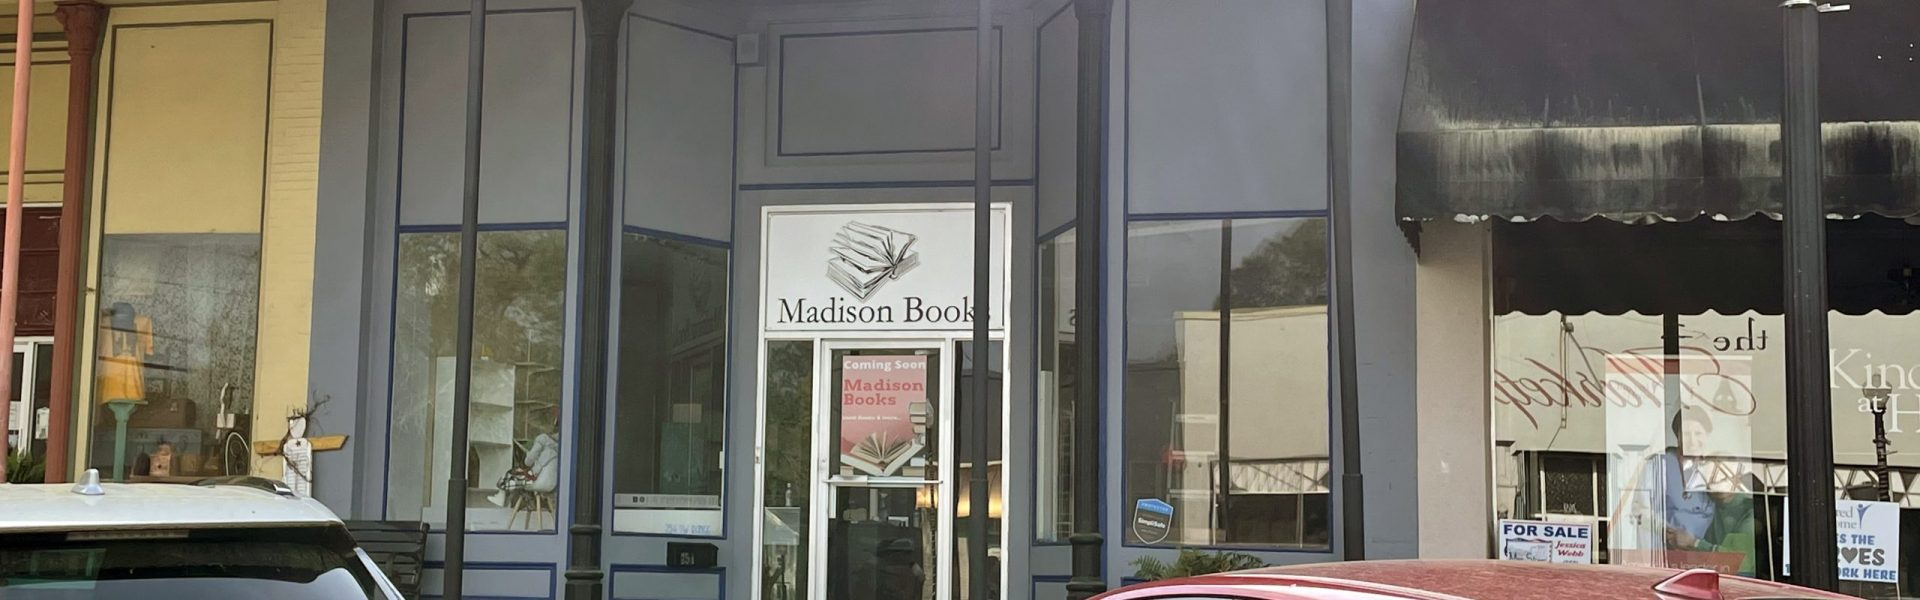 Madison Books